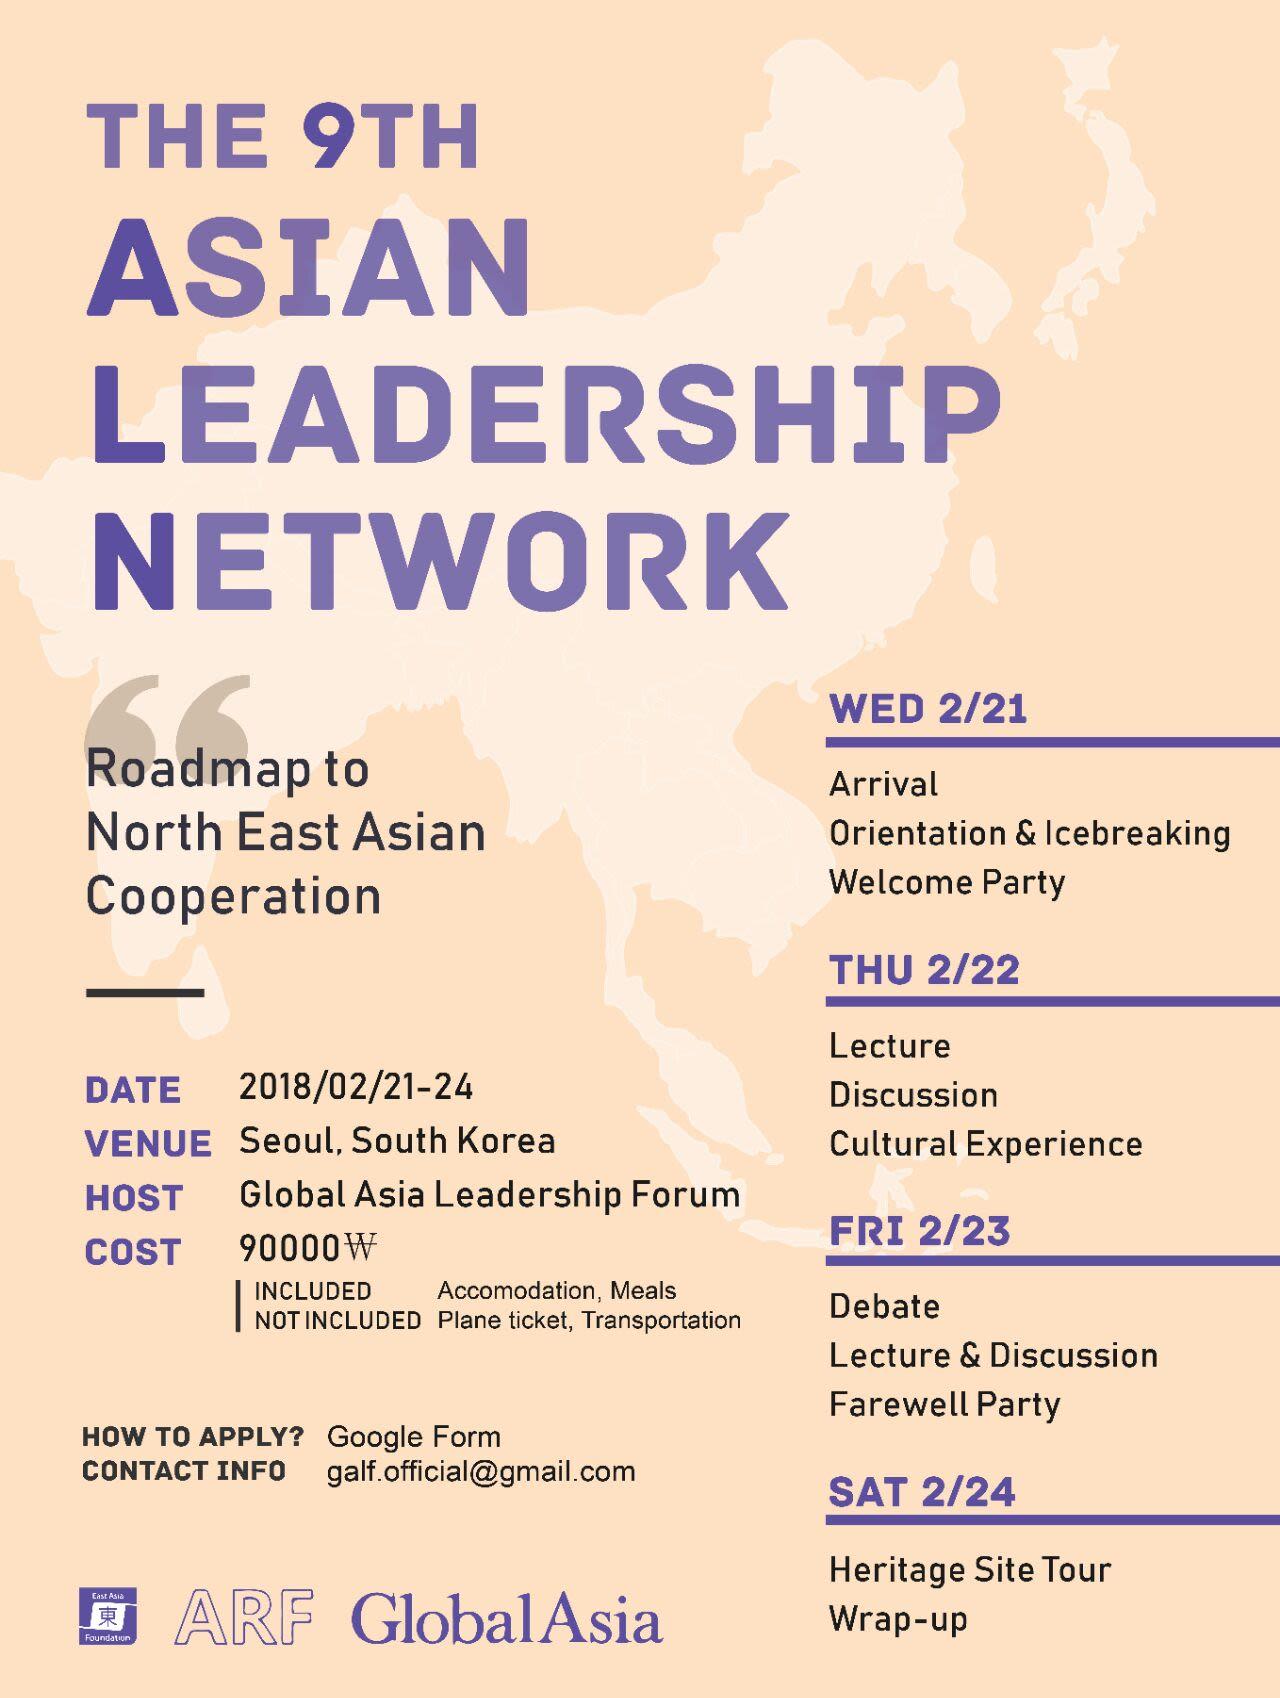 [Global Asia Leadership Forum] 아시아 리더십 포럼 참가자 모집